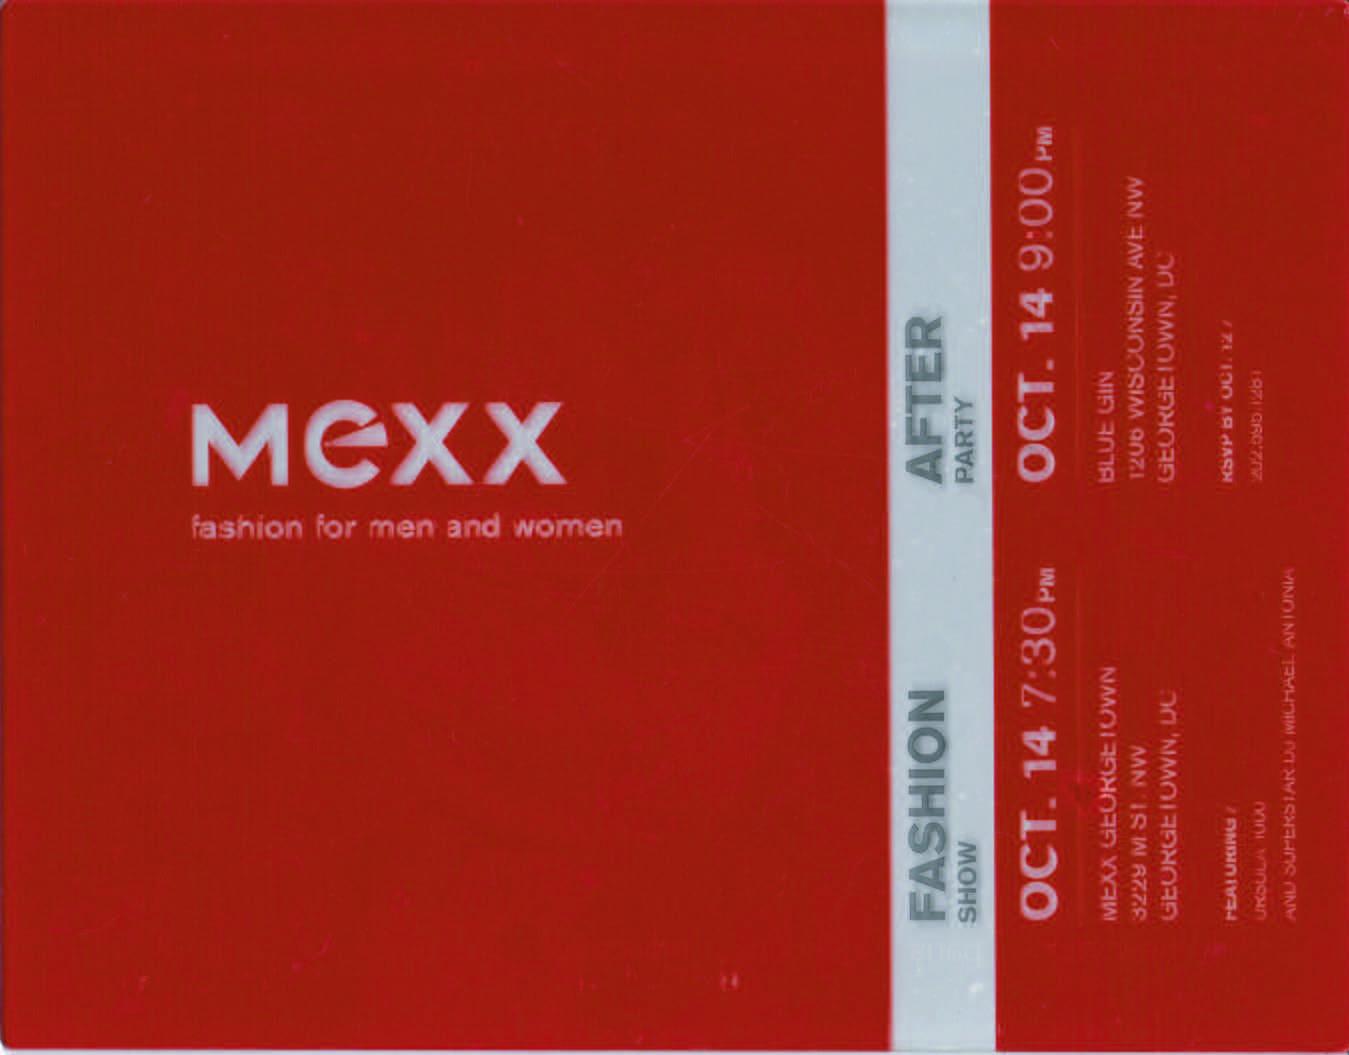 mexx_Page_1_Image_0002.jpg